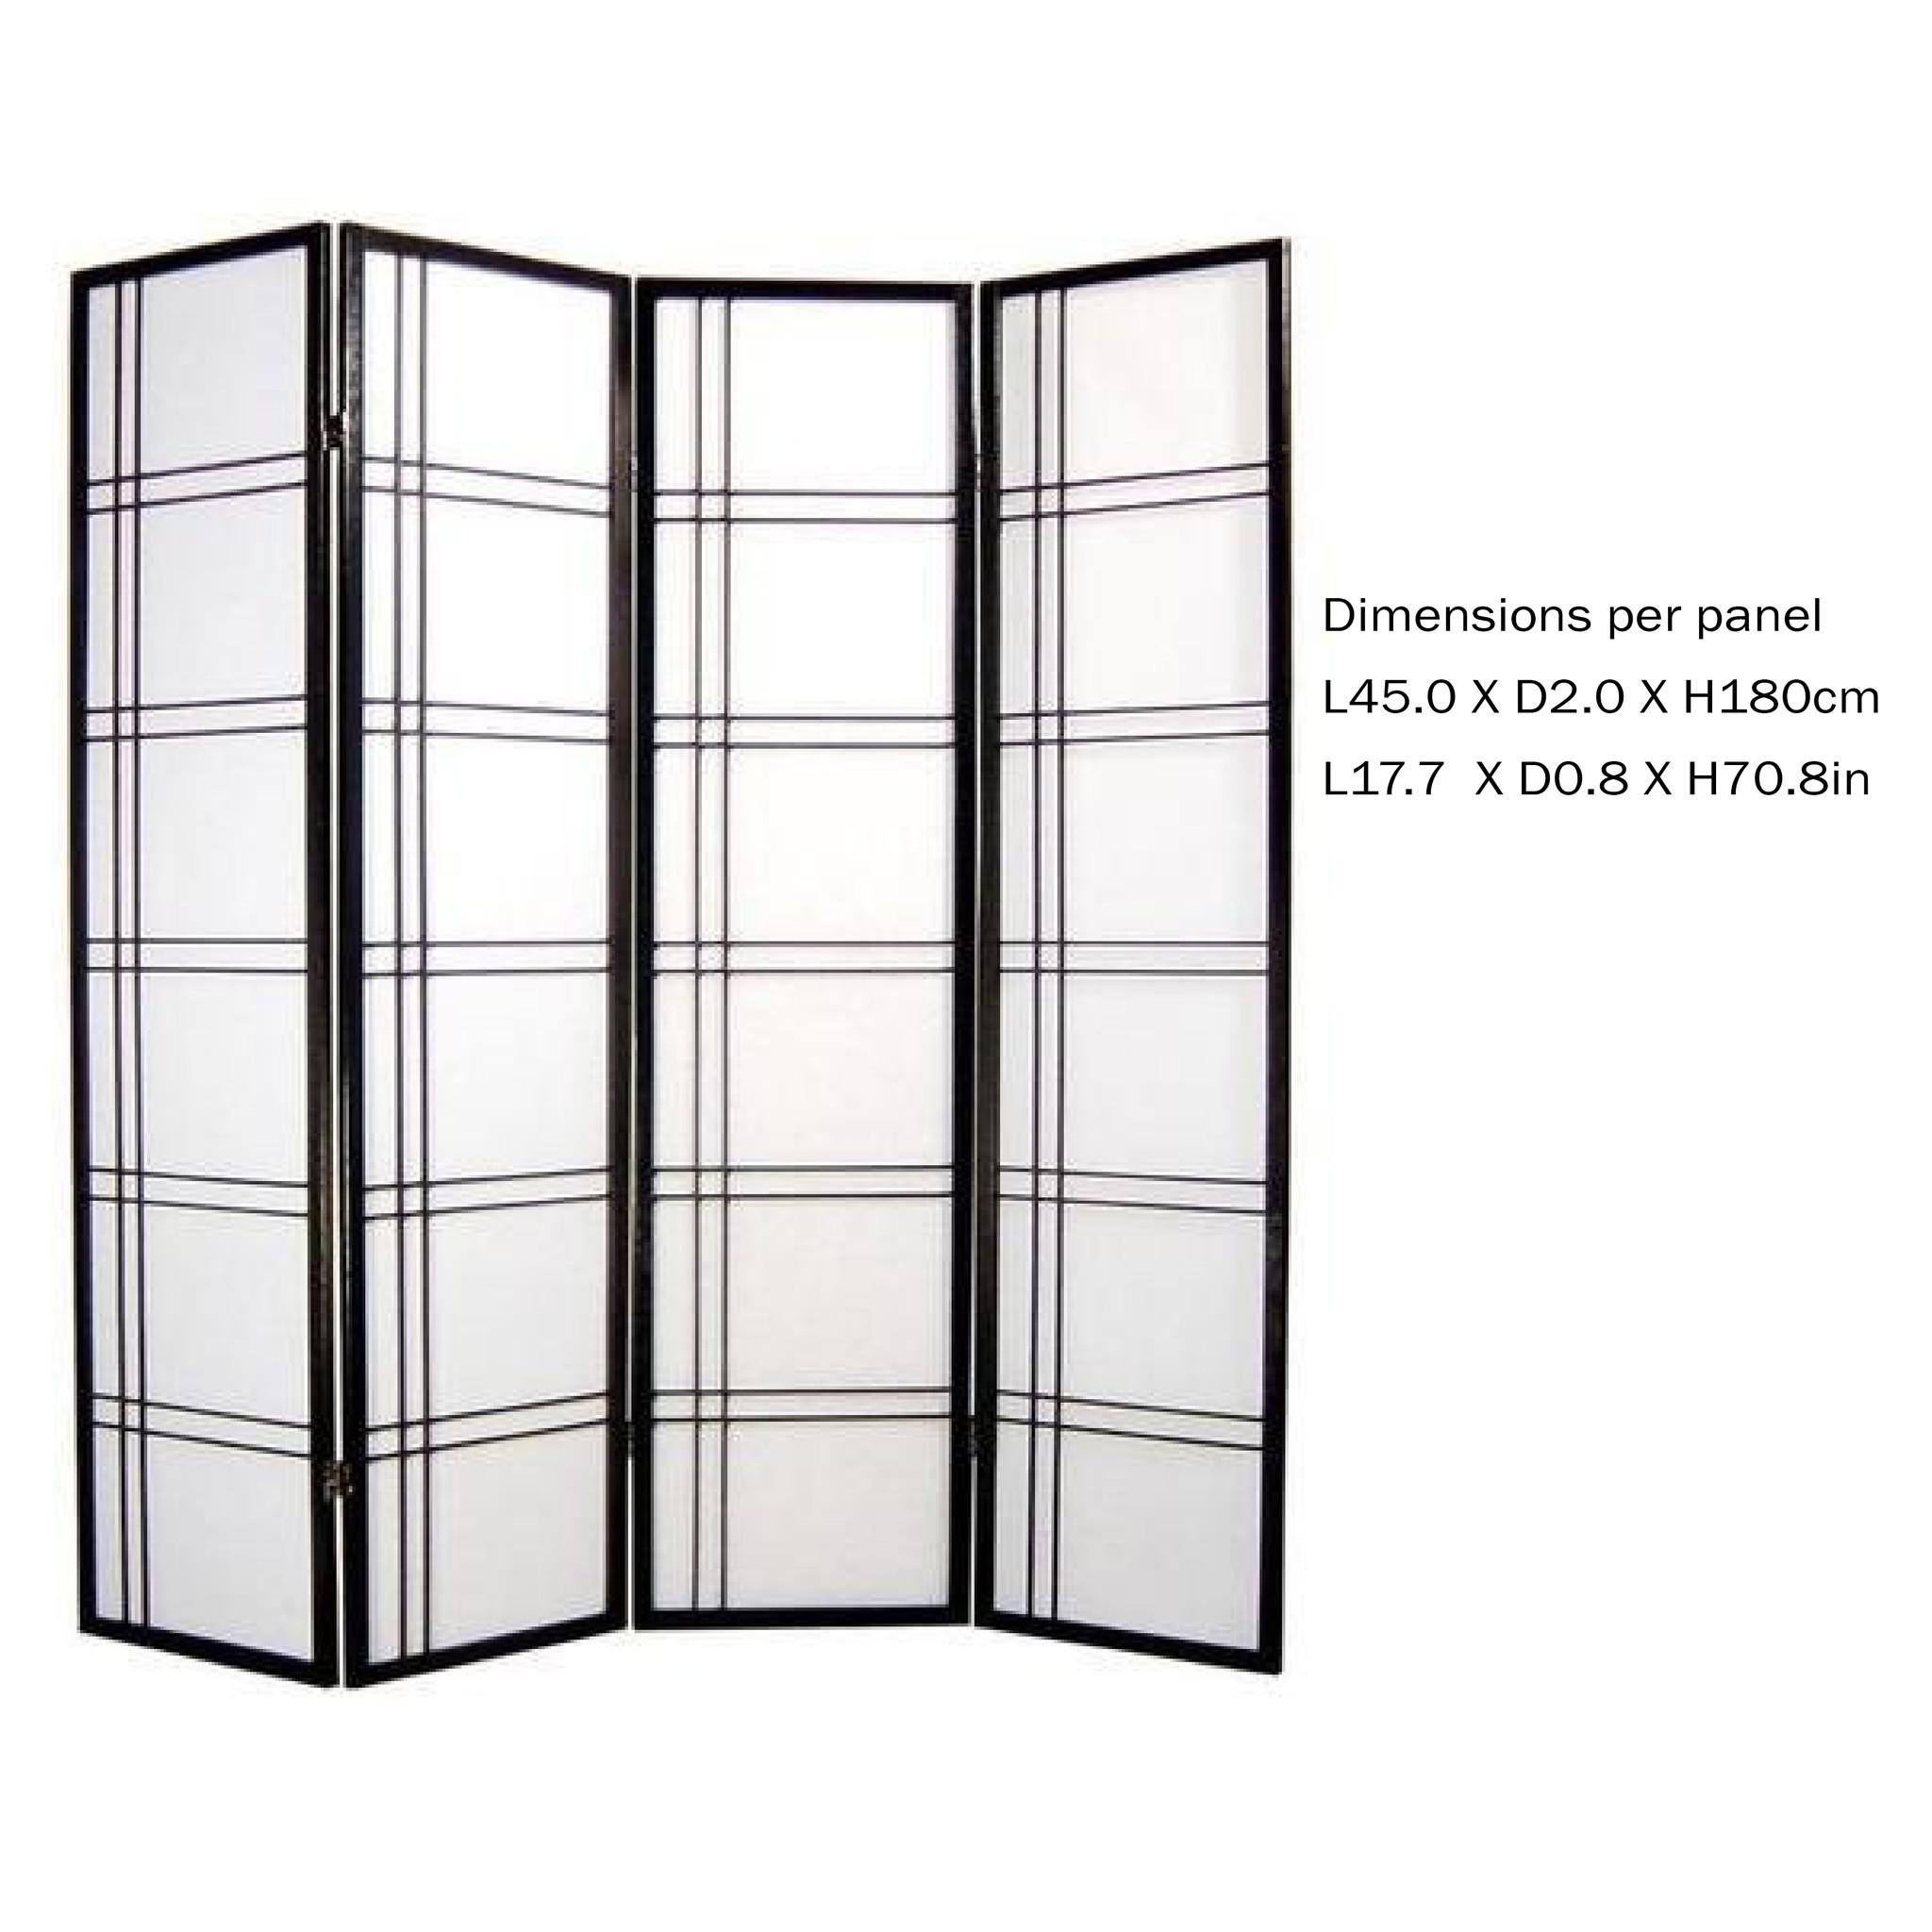 Fine Asianliving Japanese Room Divider L180xh180cm Privacy Screen Shoj Orientique Asianliving